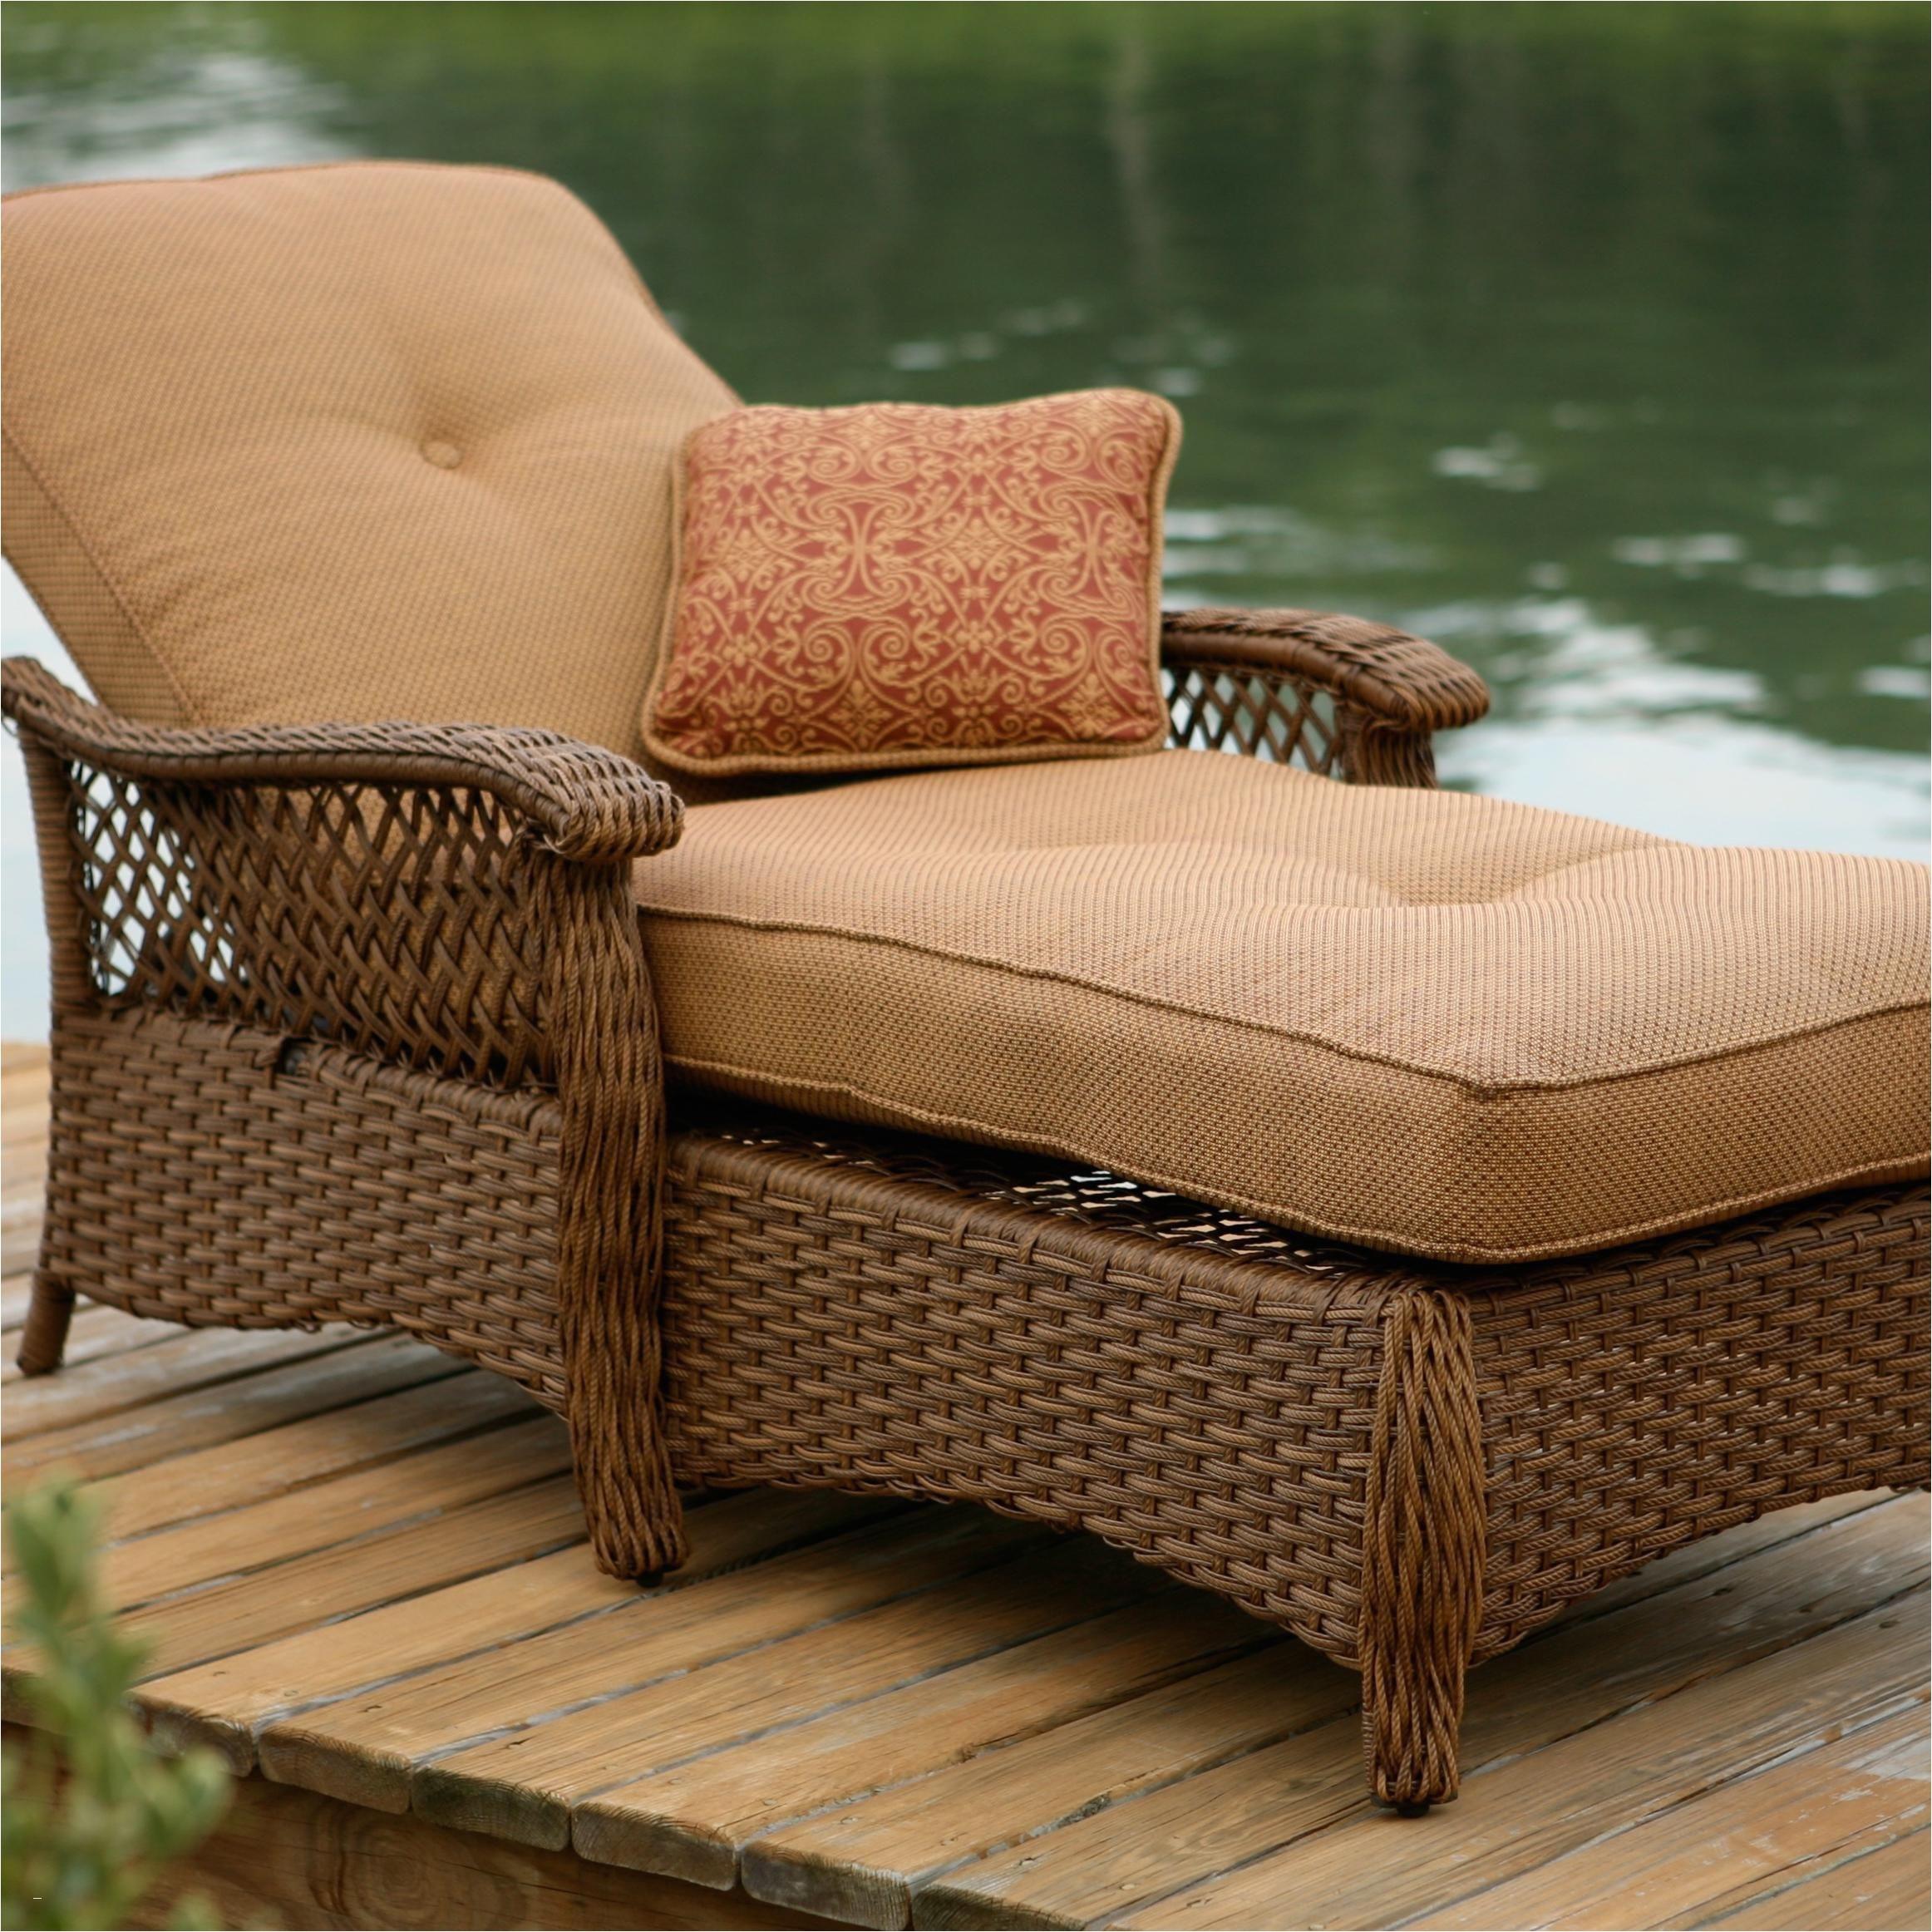 Bjs sofa Set Bjs Outdoor Furniture Lovely Discounted Patio Furniture